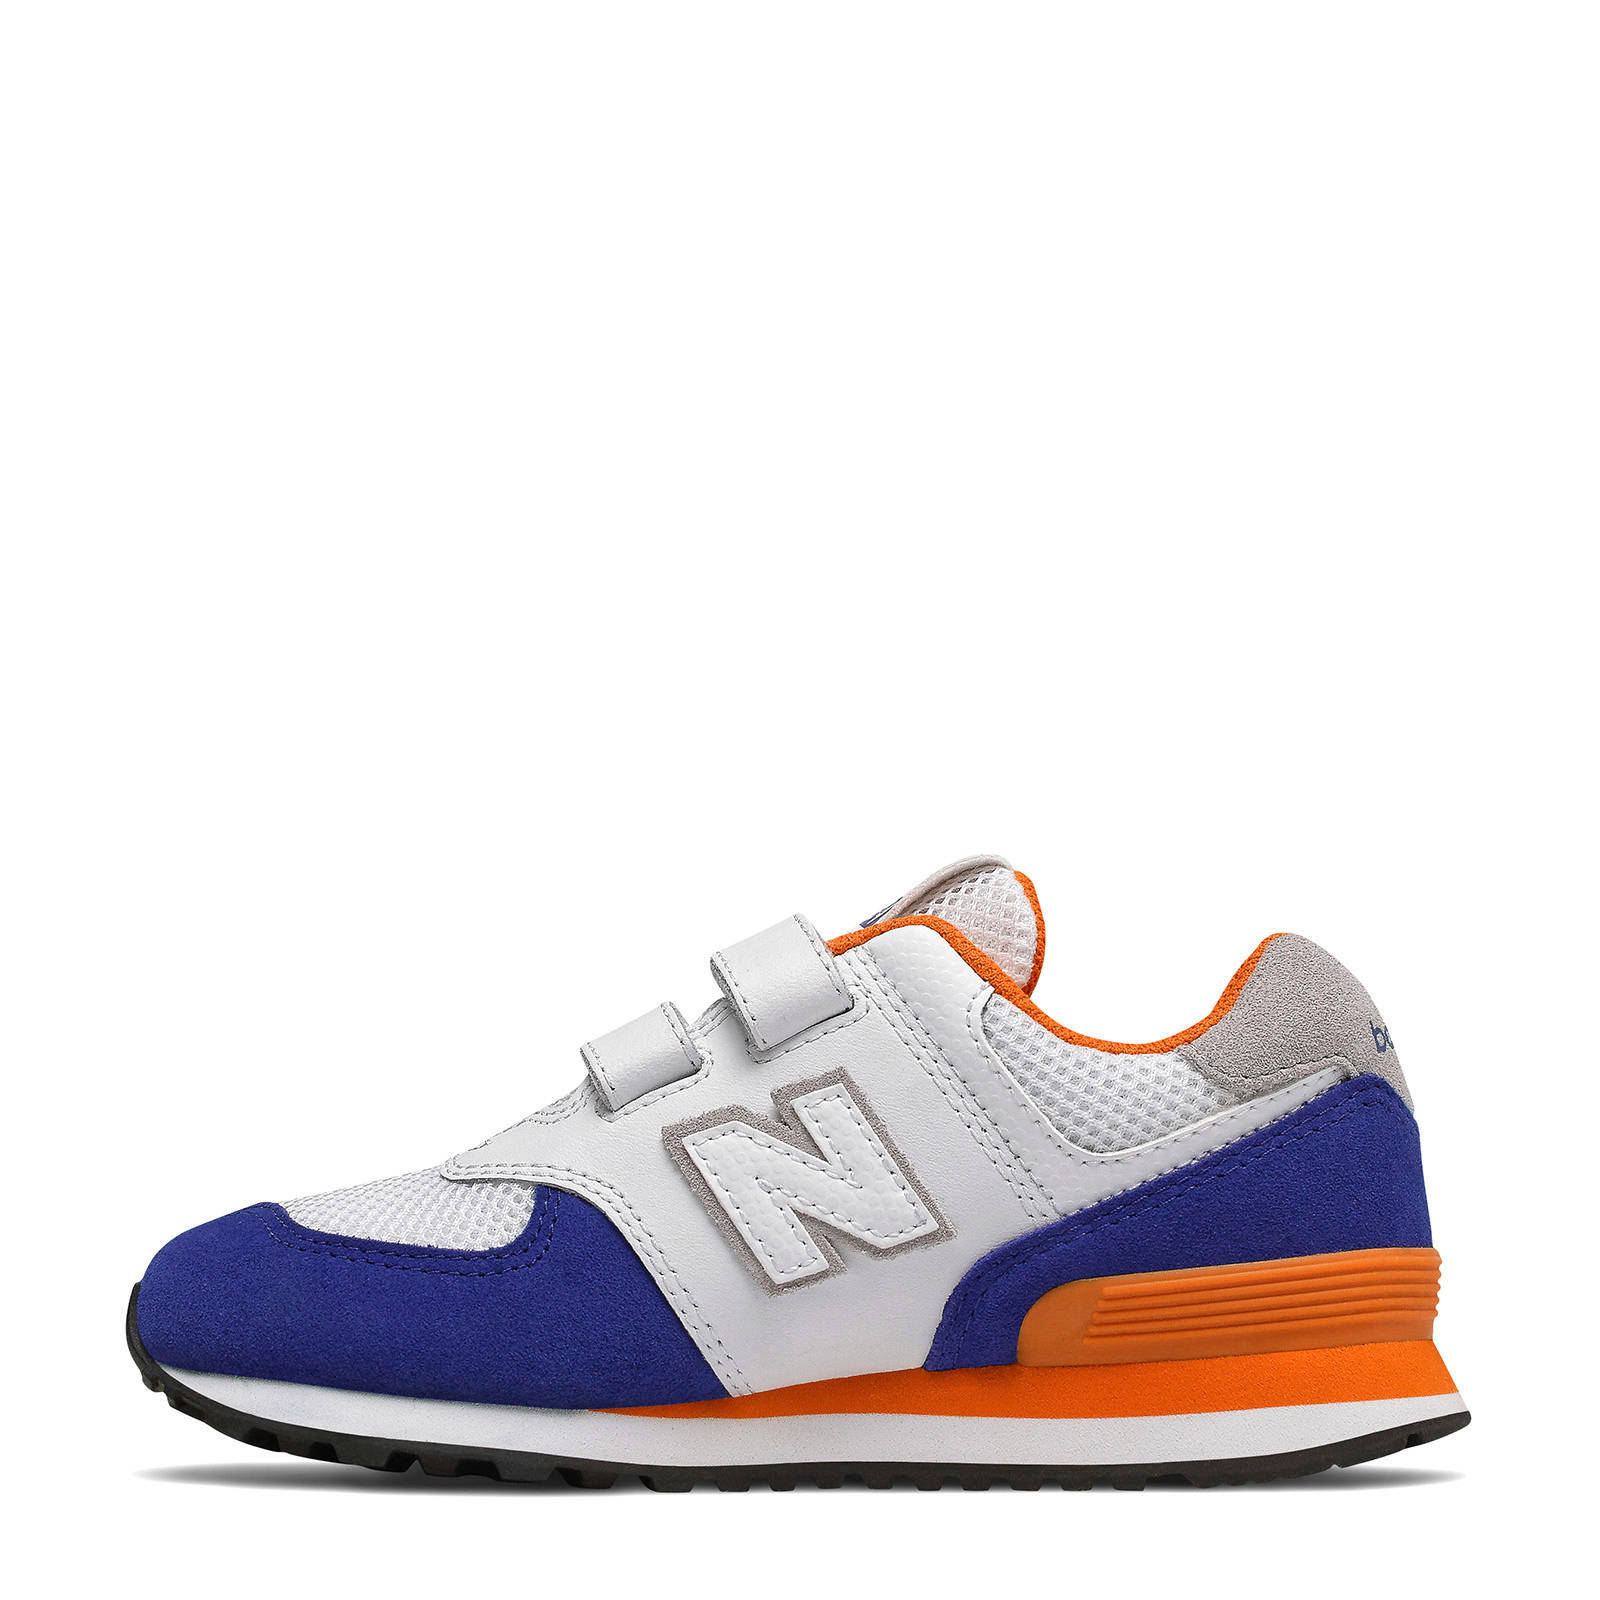 new balance 574 blauw oranje